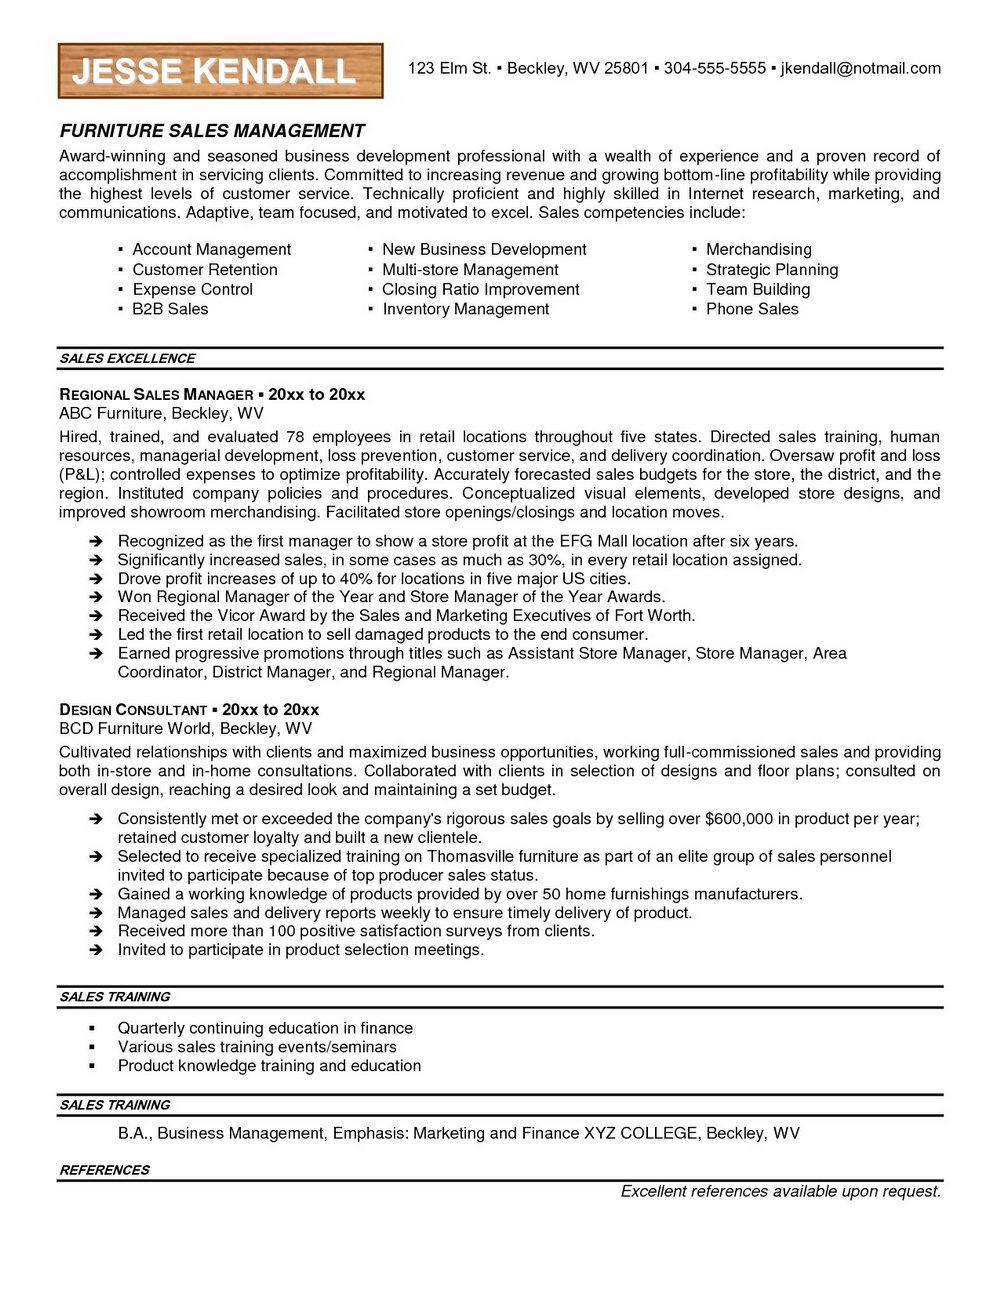 Free Sales Resume Templates